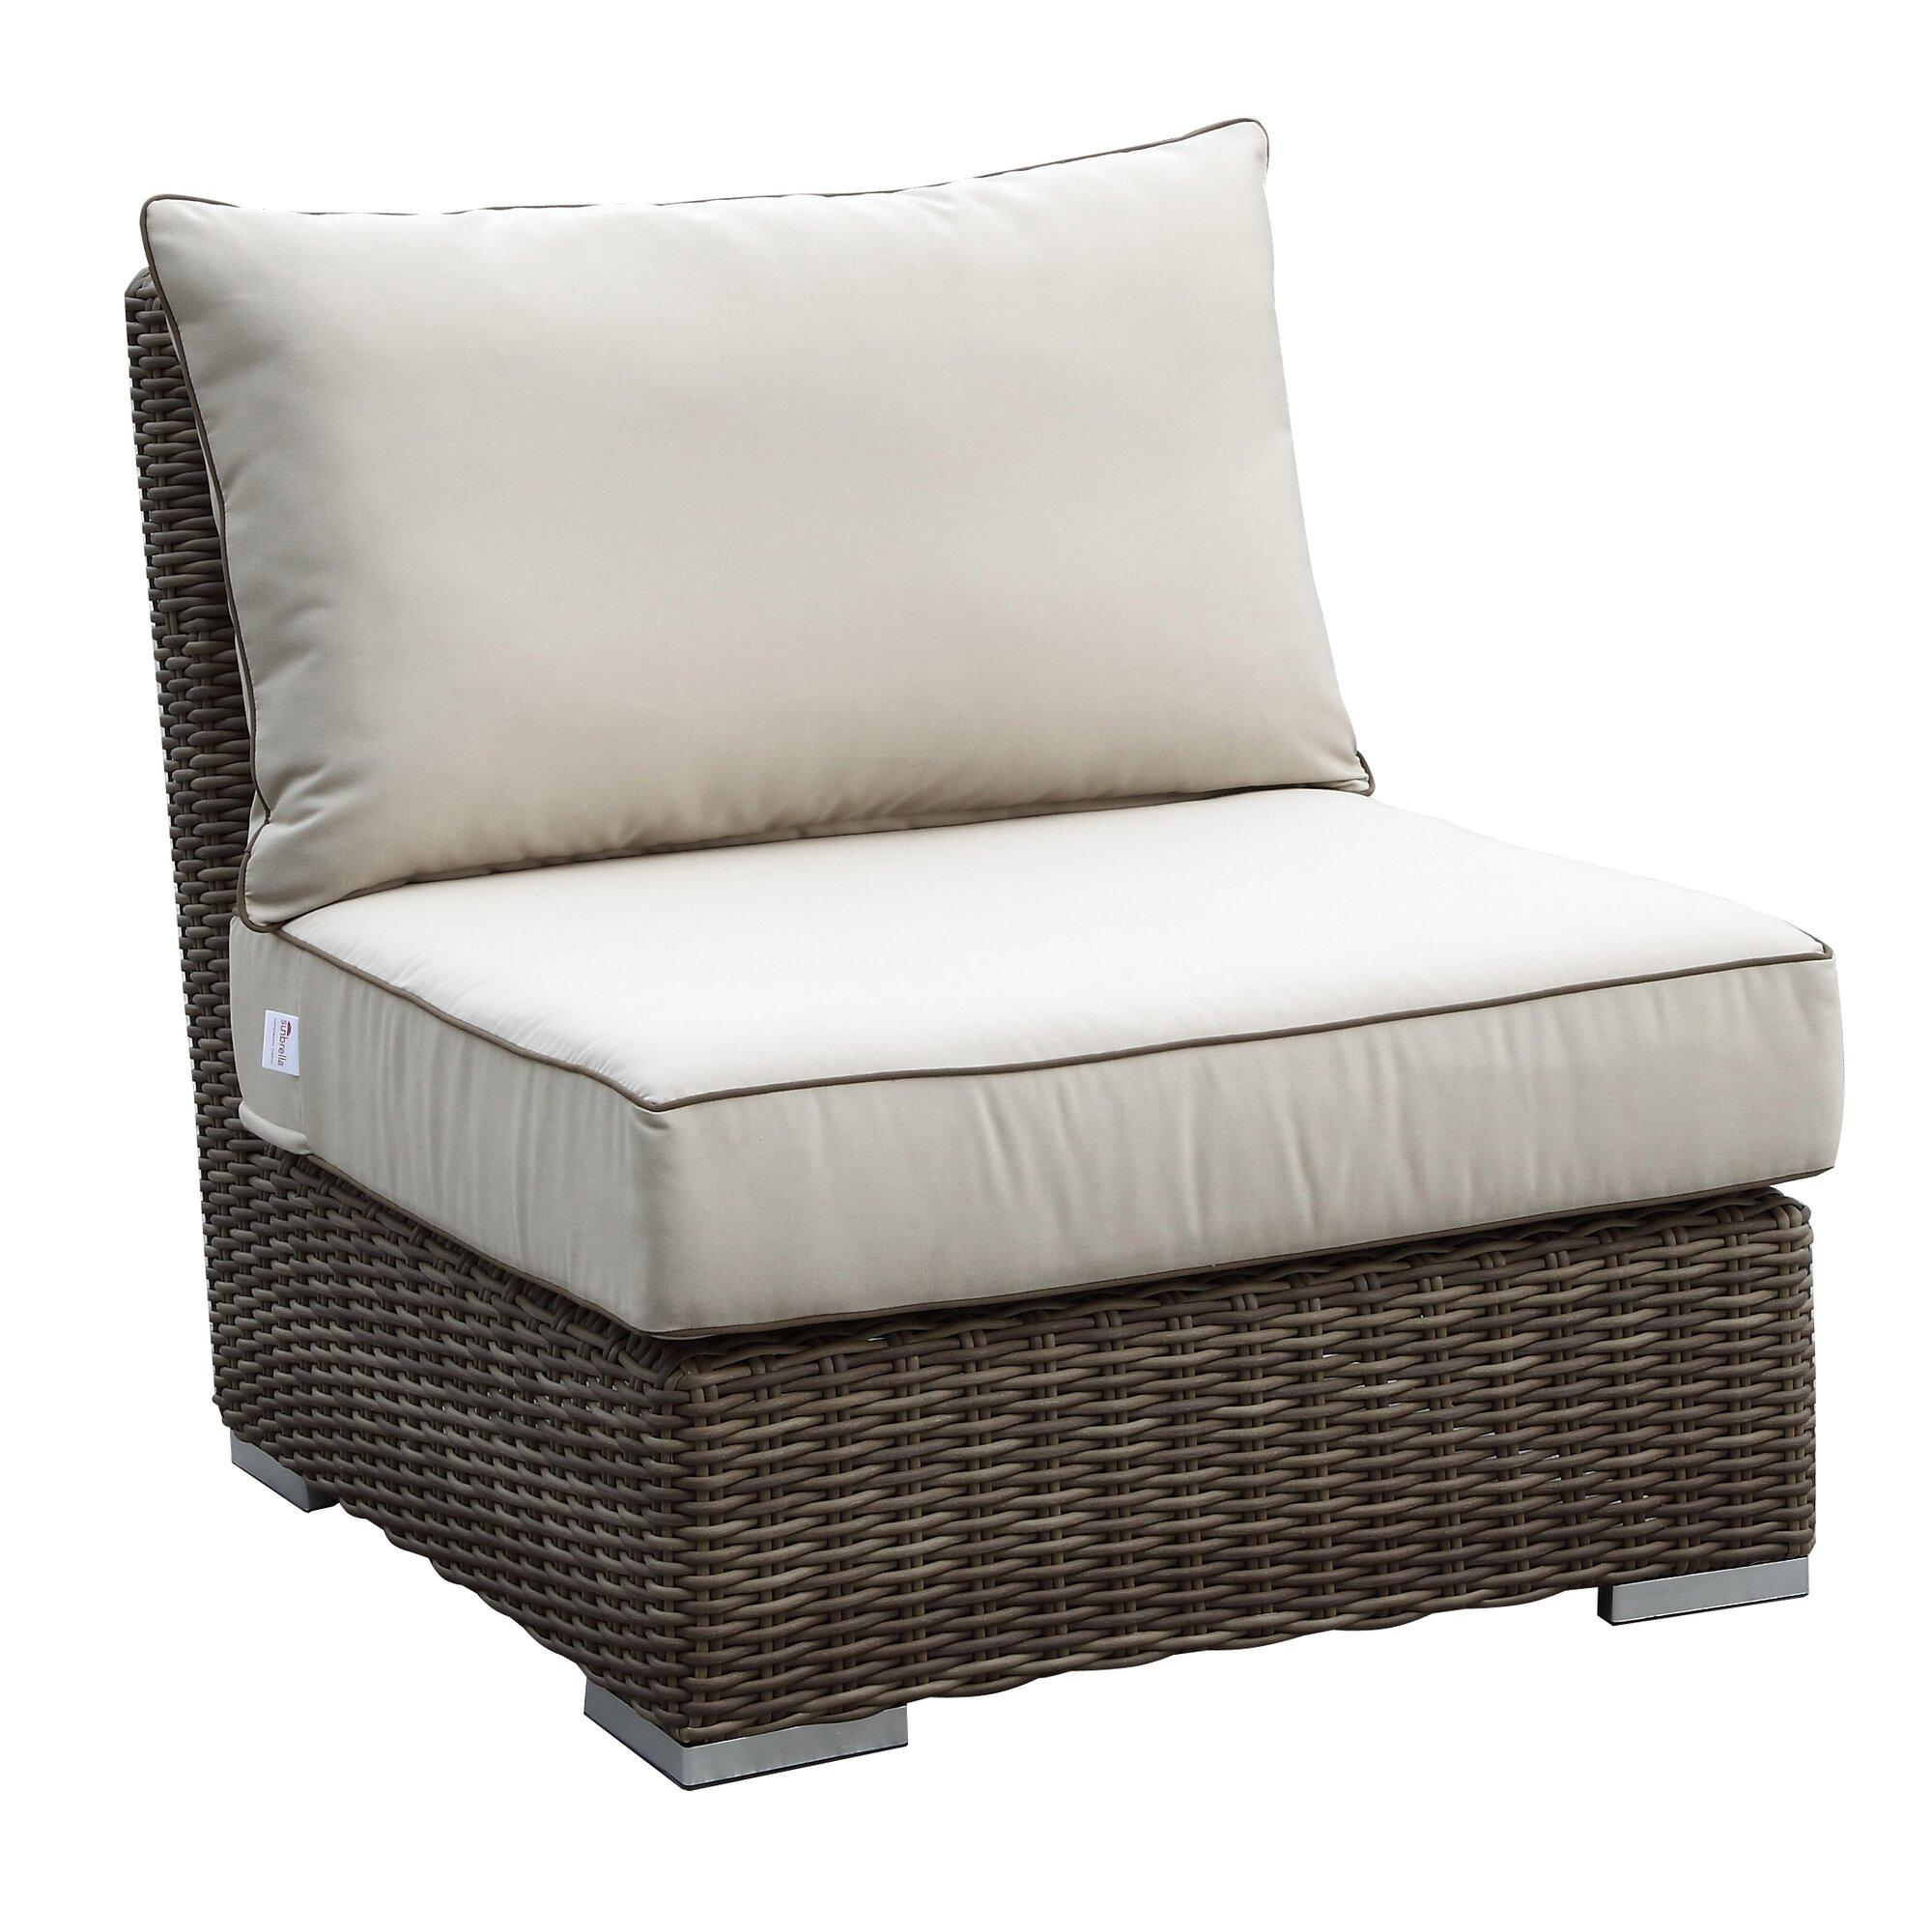 Armless club chairs - Hasler Armless Club Chair With Cushions